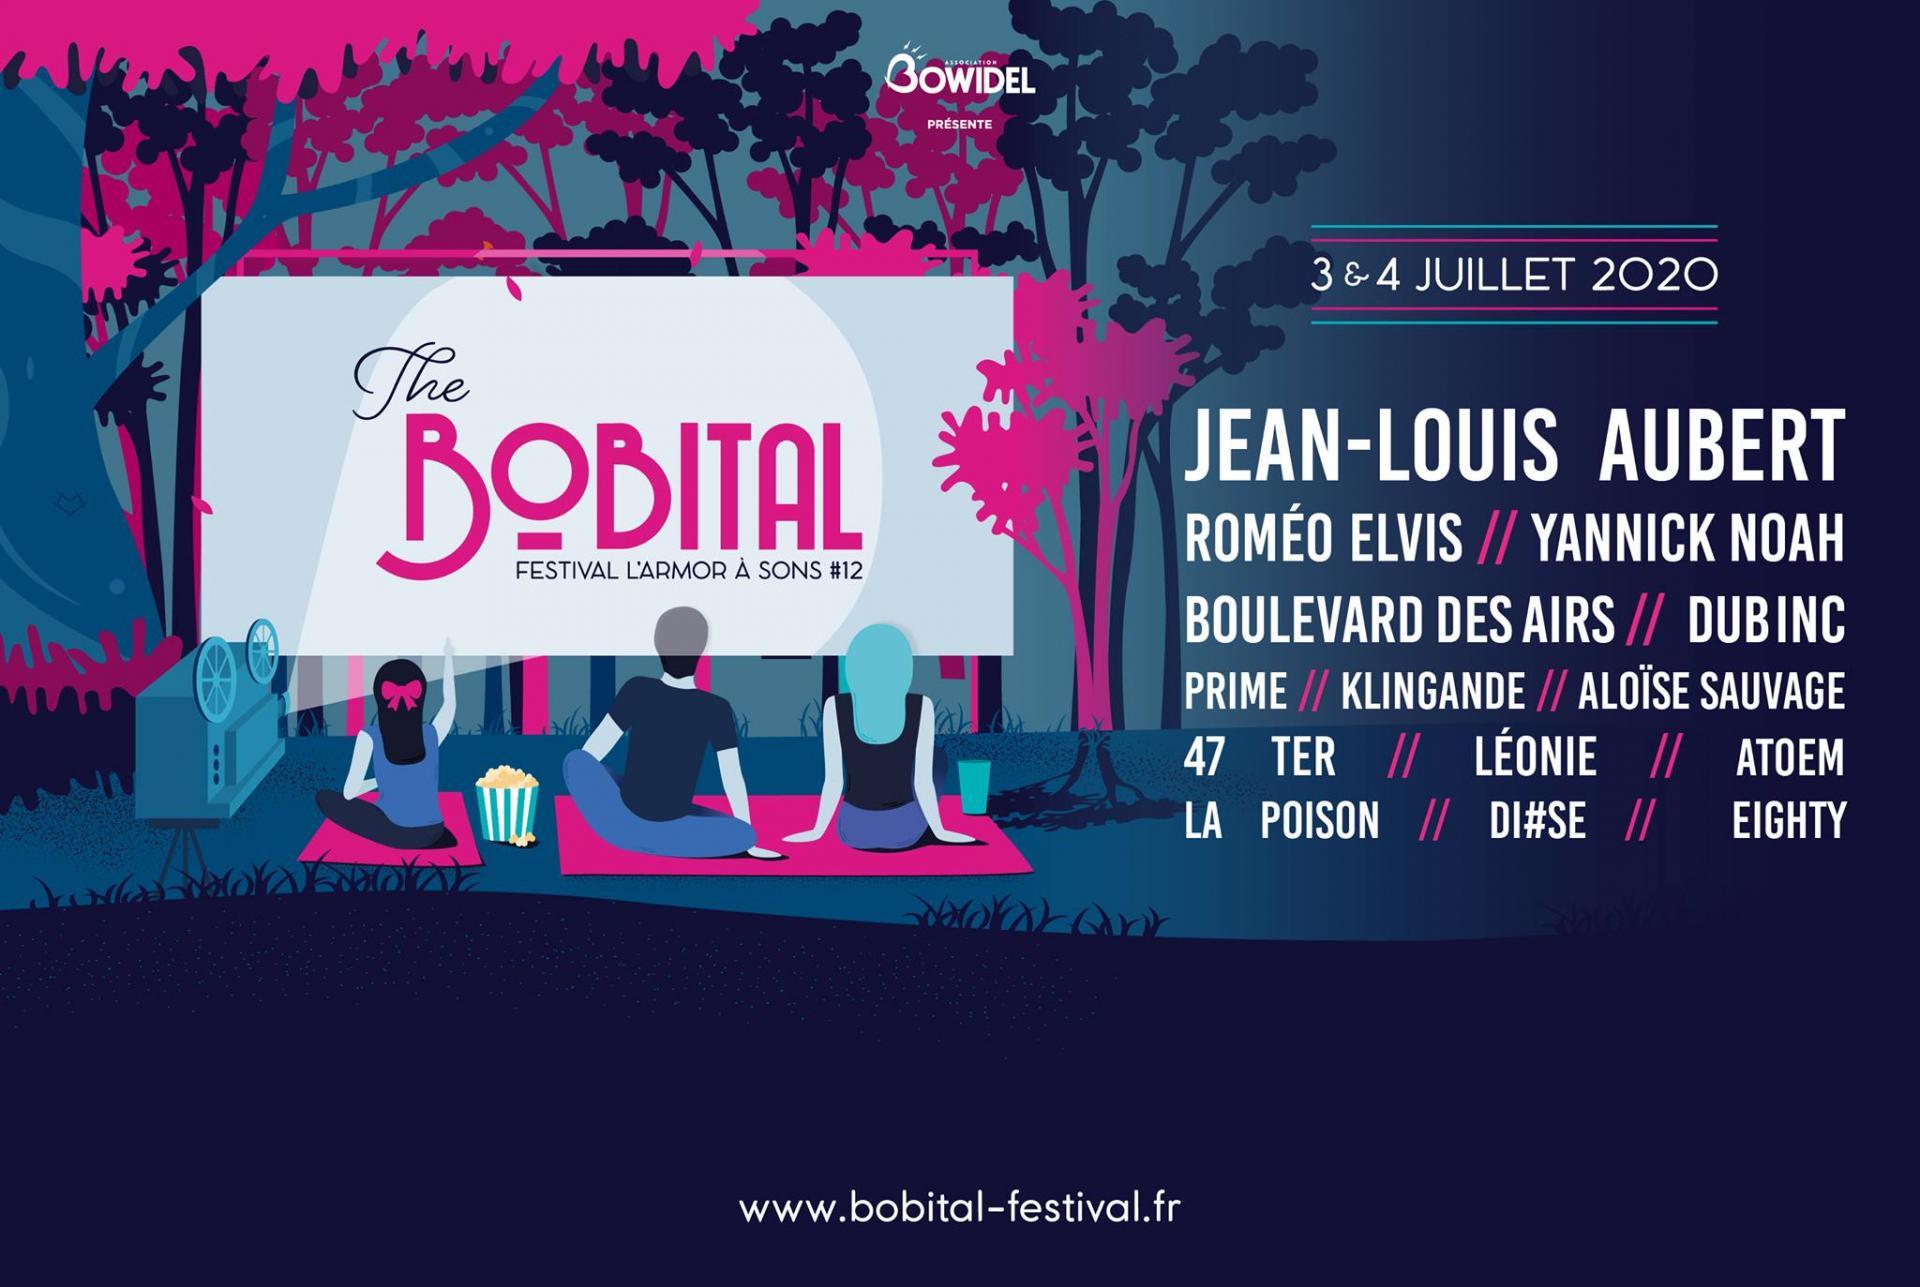 Bobital festival ban